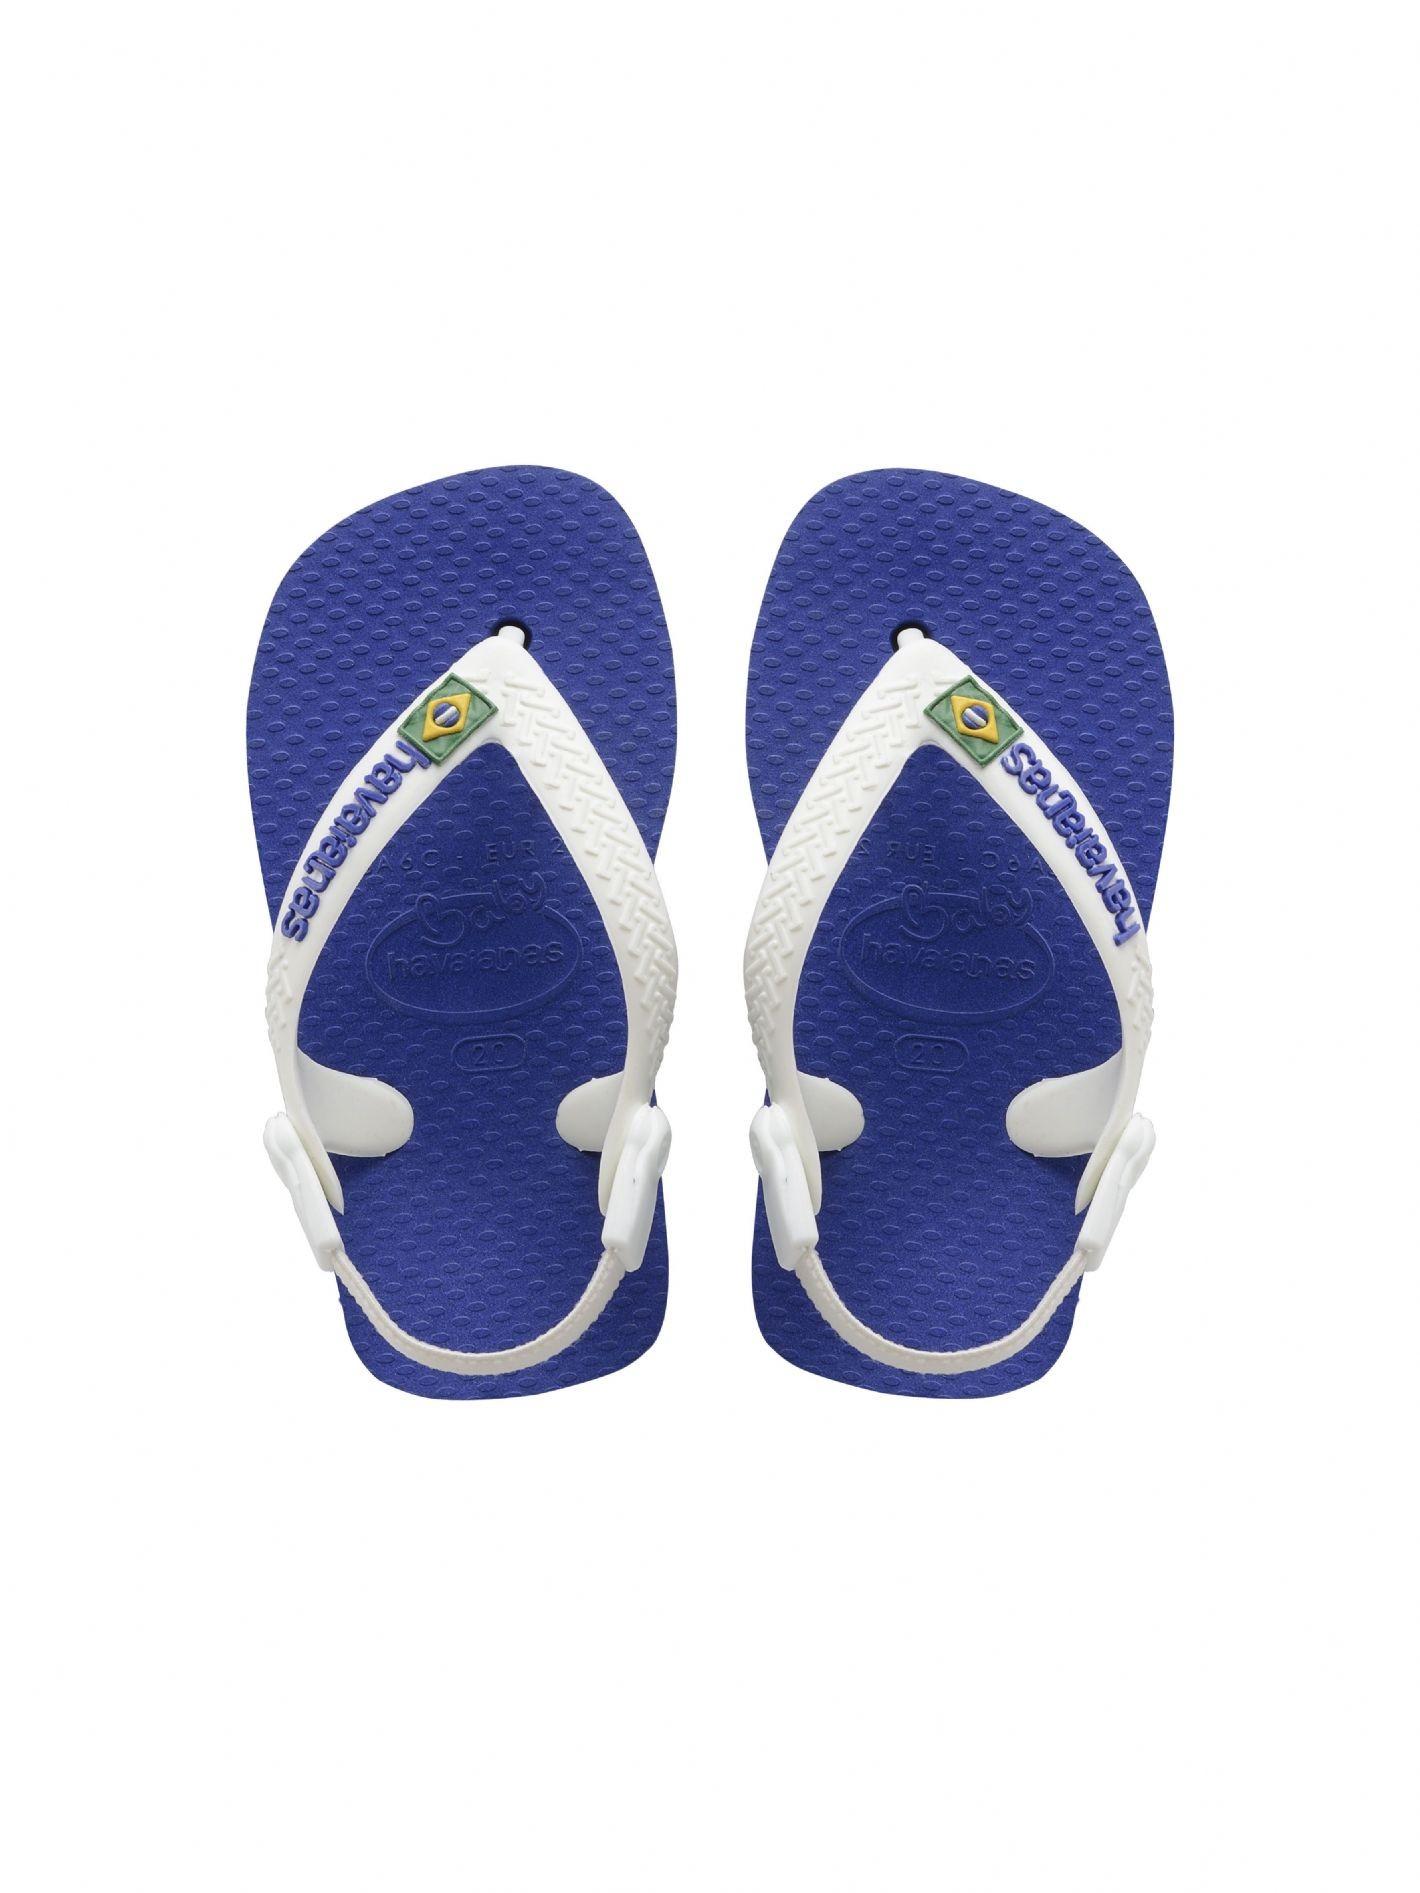 5c6b4595a Sandals Flip-flops - Baby Brasil Logo Marine Blue - Brand Havaianas